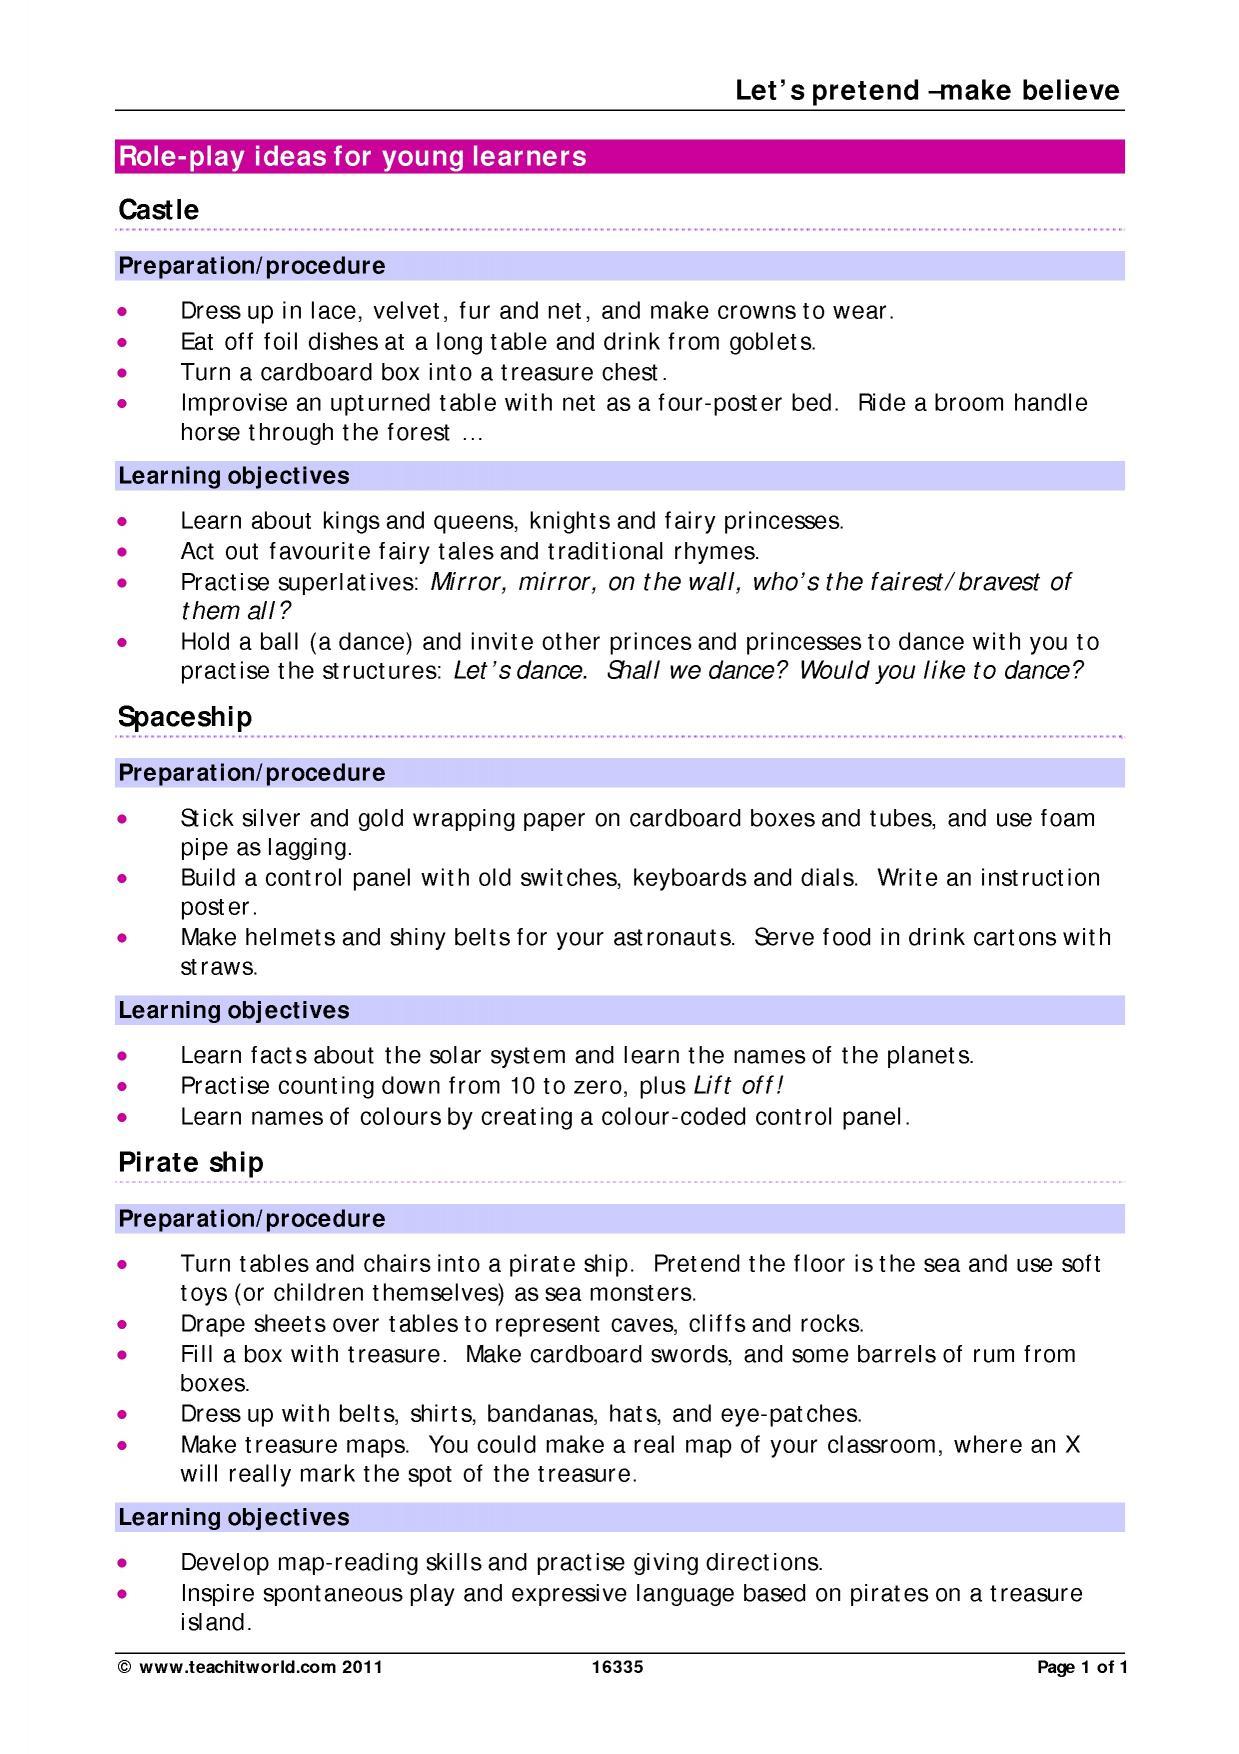 Creativity B2 Upper Intermediate Resources By Level